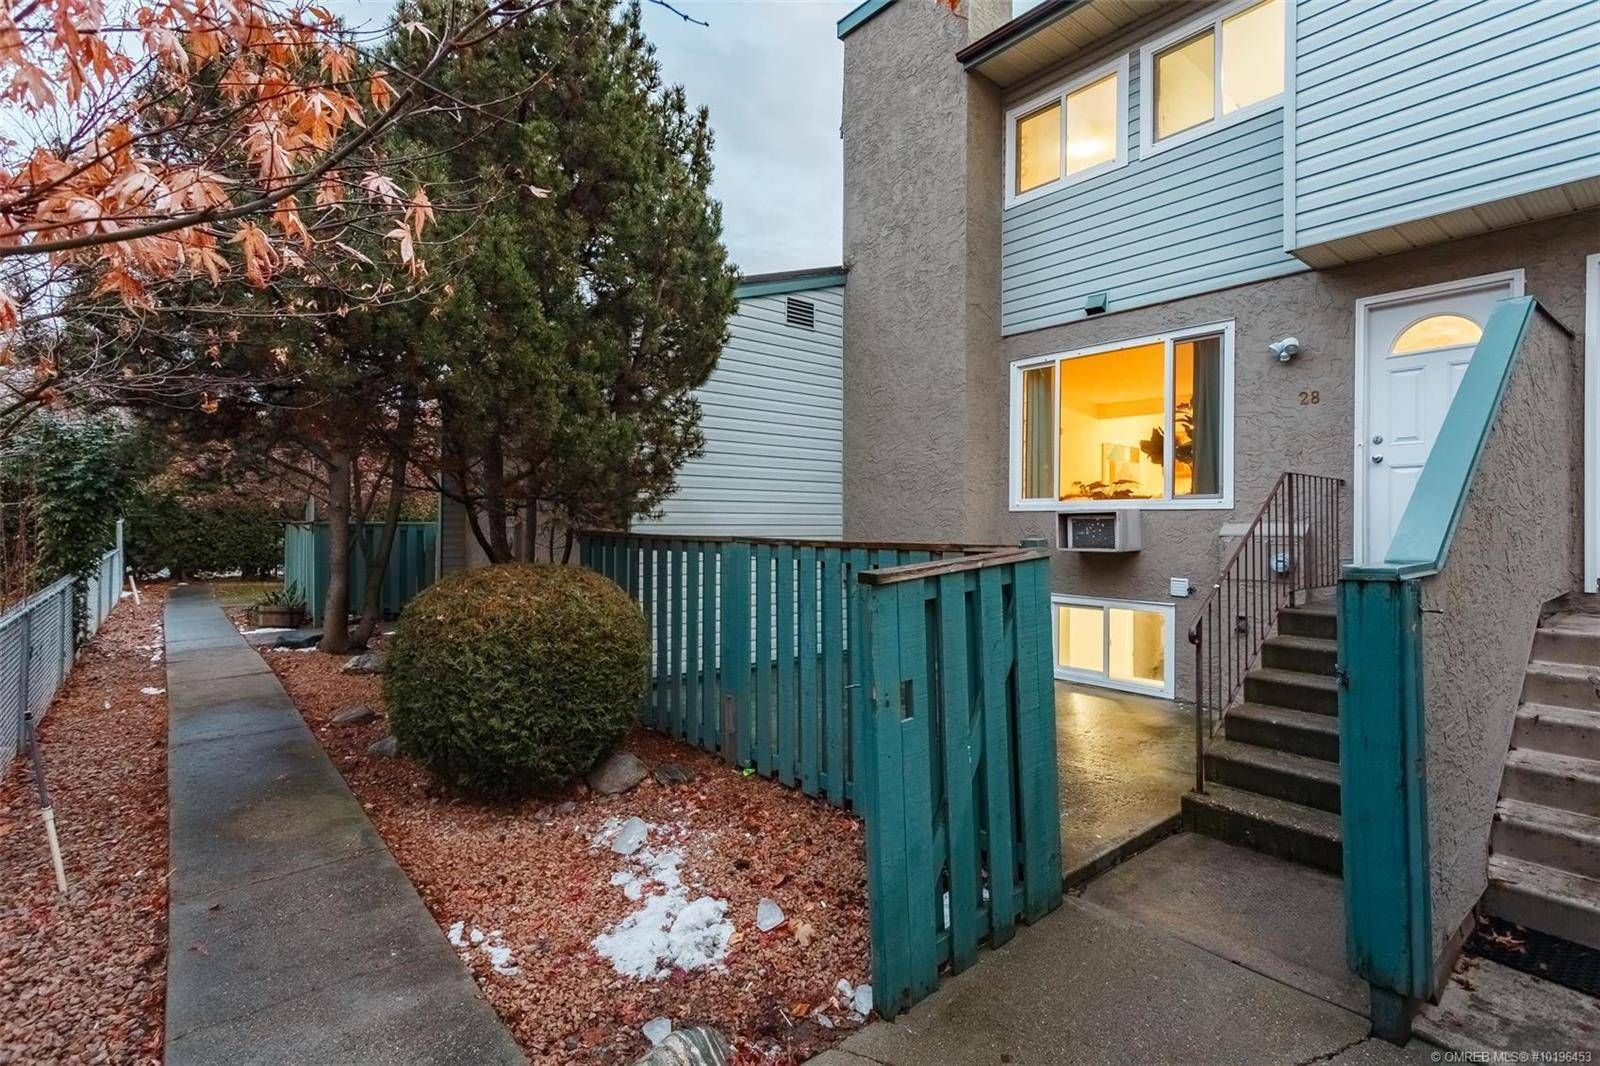 Townhouse for sale at 1471 Inkar Rd Unit 28 Kelowna British Columbia - MLS: 10196453